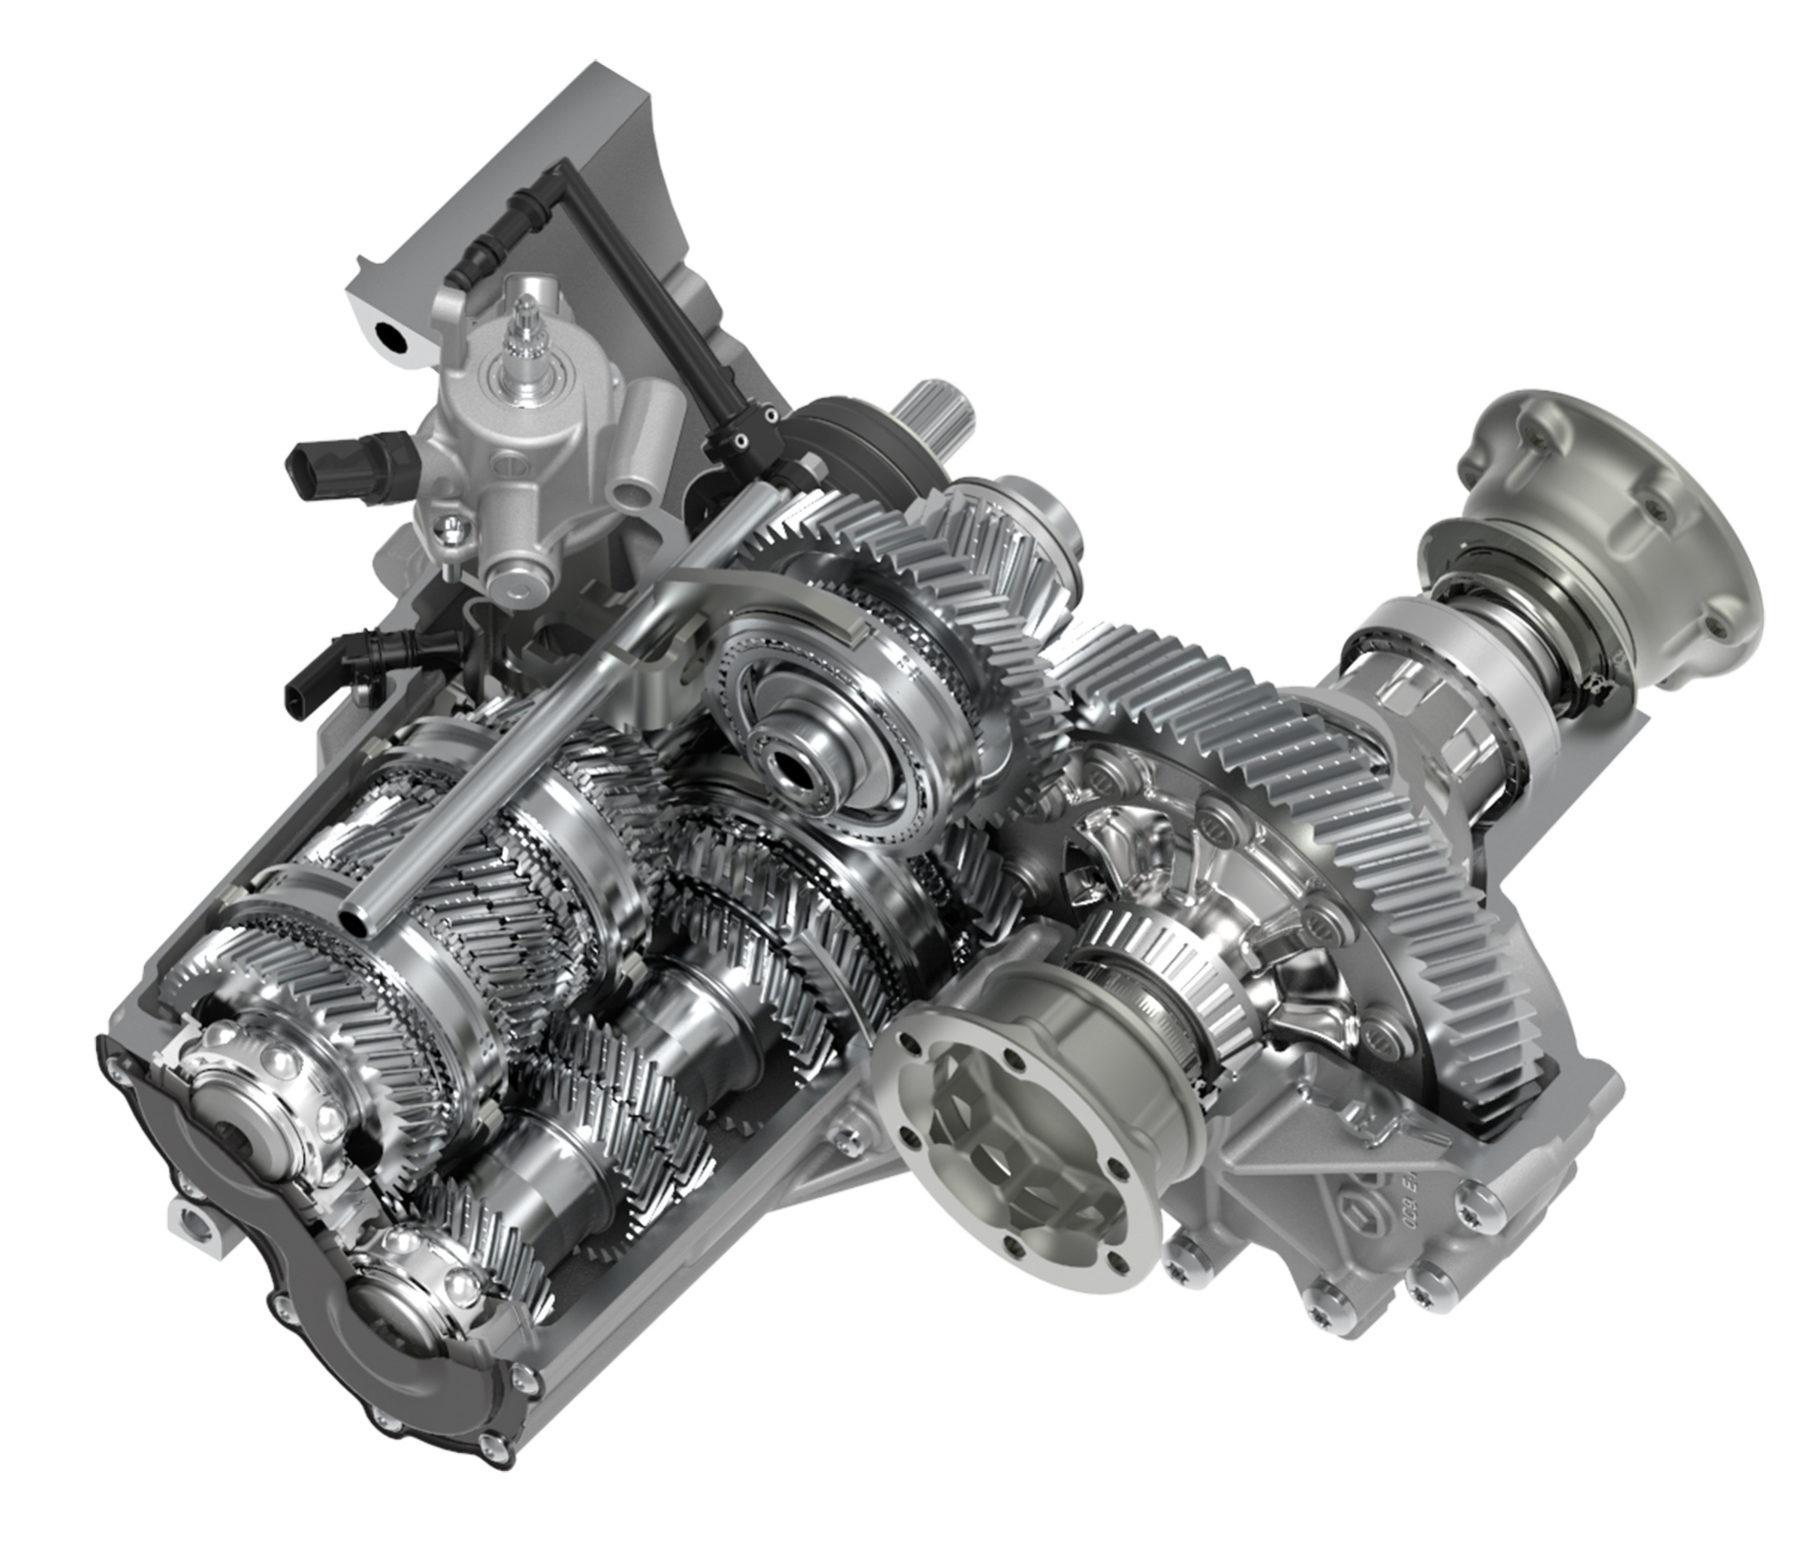 MQ281 manual transmission